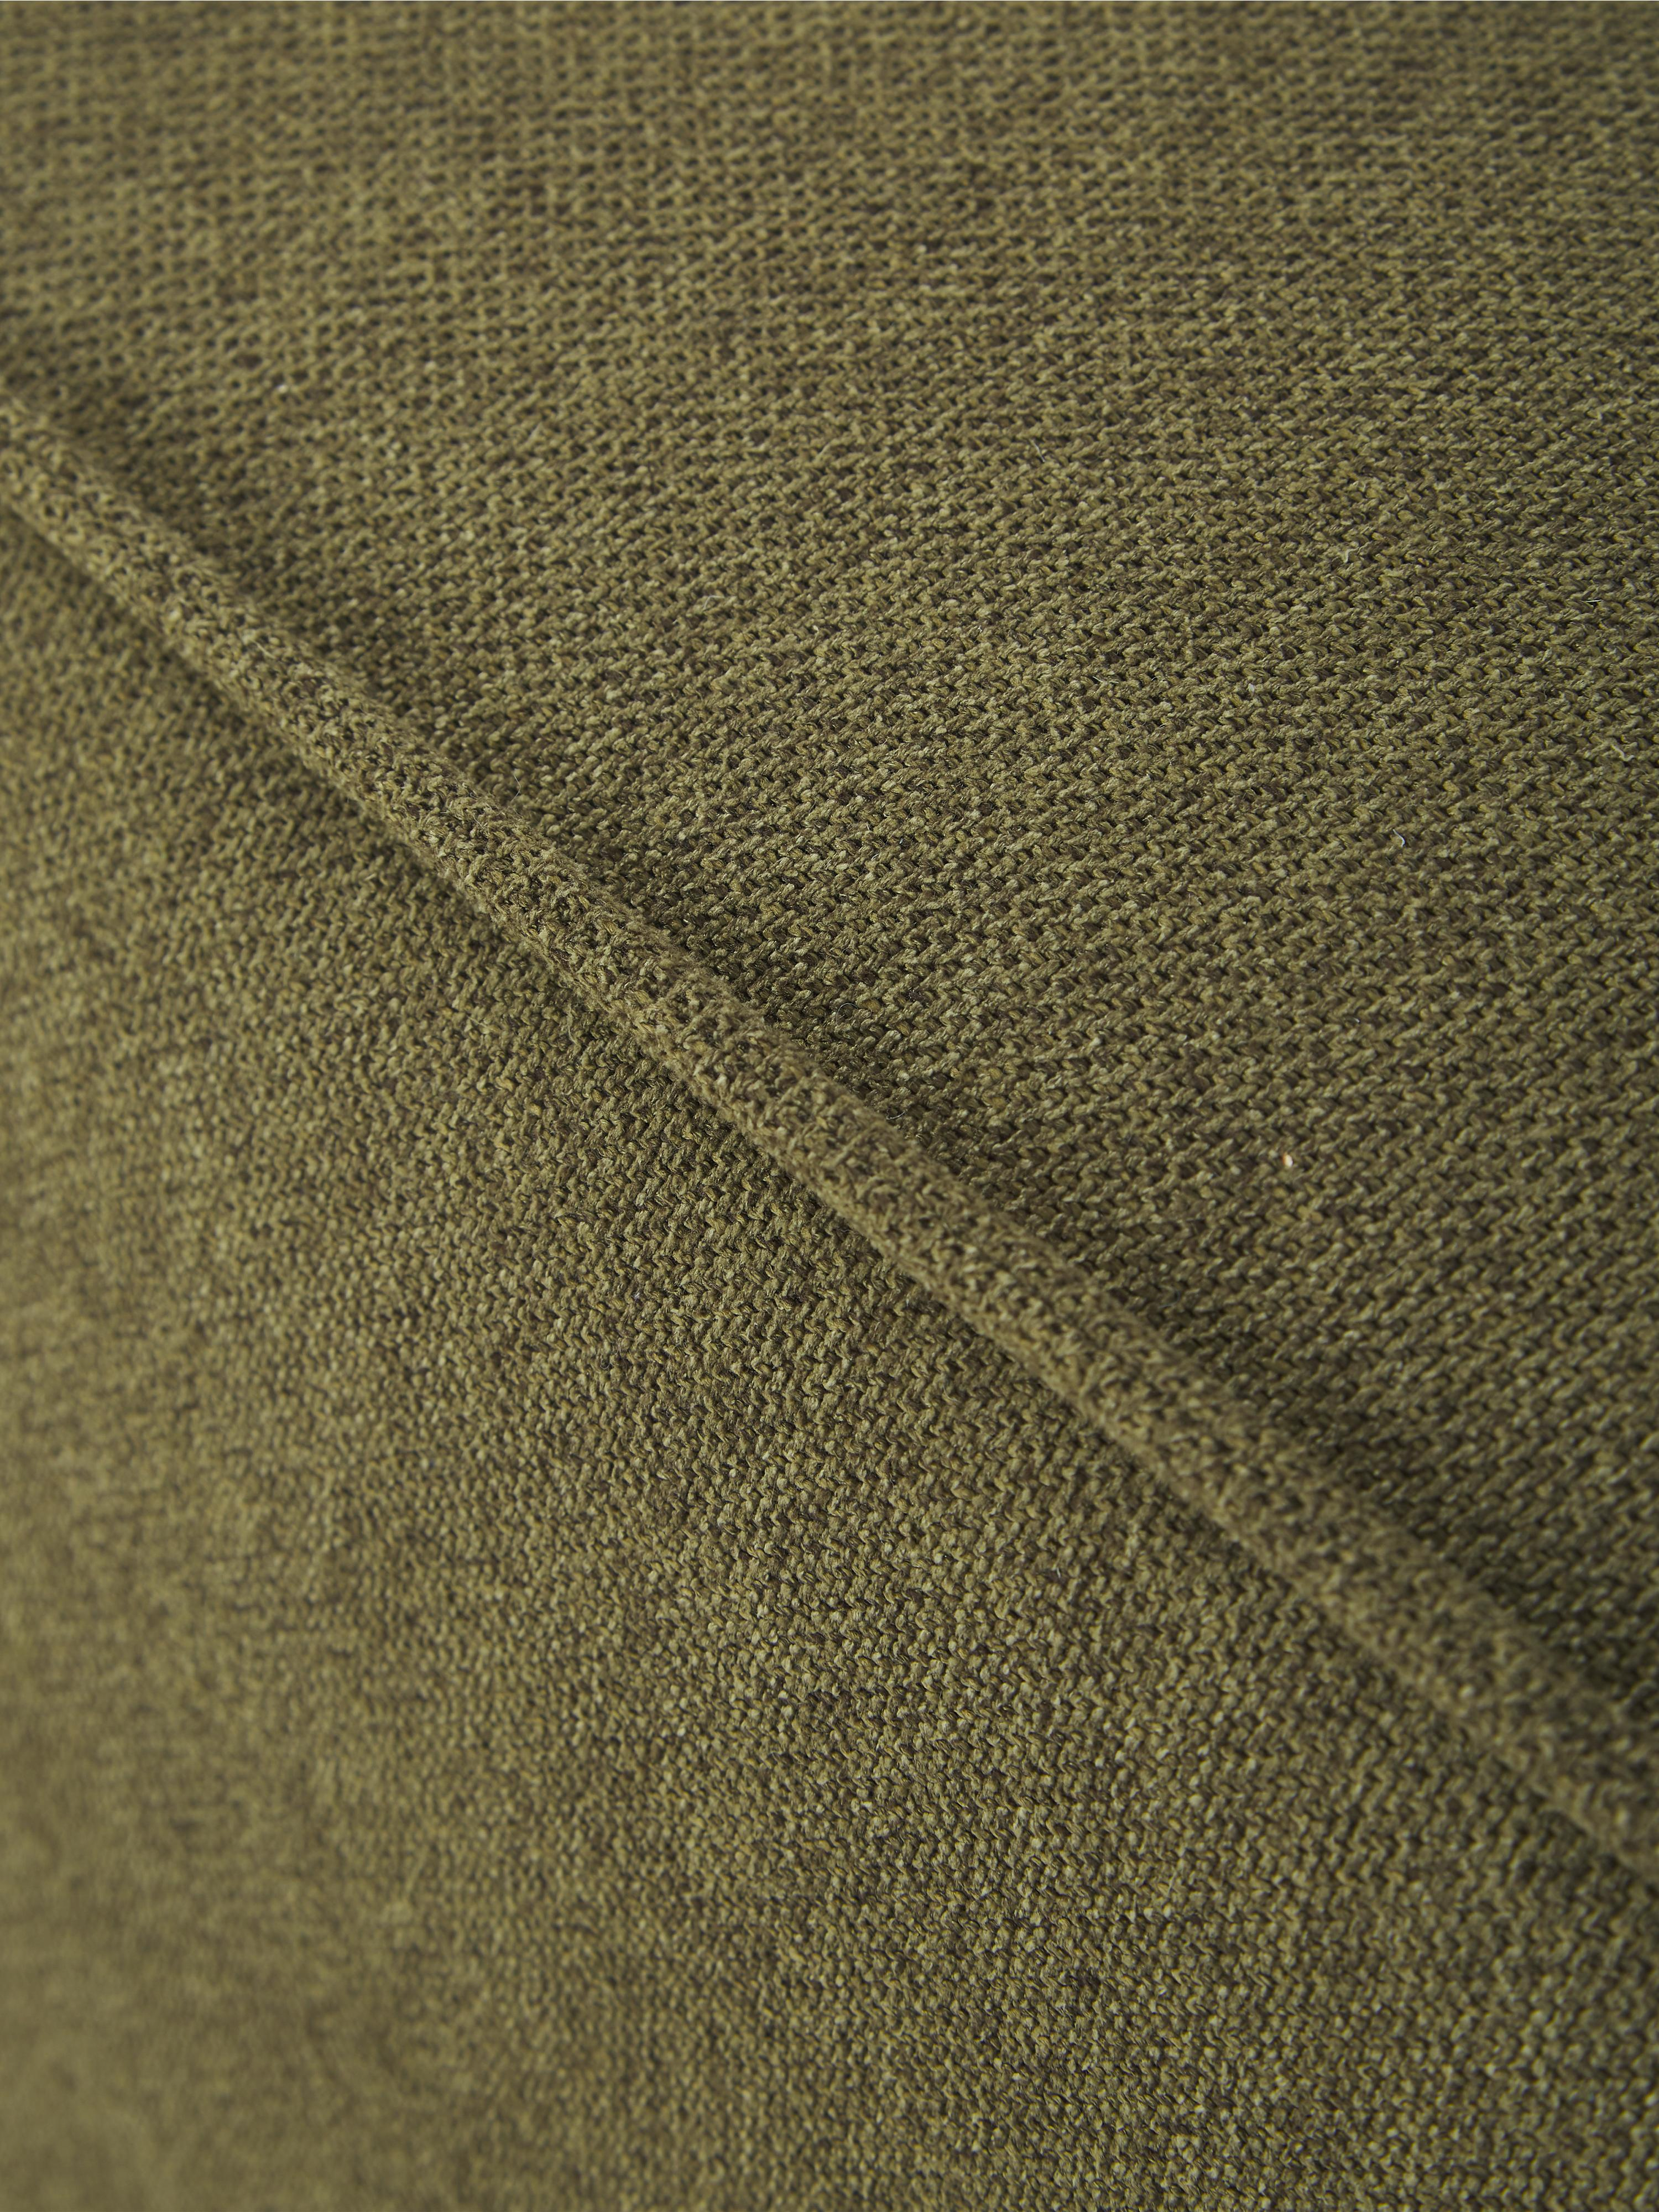 Modulare Ottomane Lennon, Bezug: Polyester Der hochwertige, Gestell: Massives Kiefernholz, Spe, Füße: Kunststoff, Webstoff Grün, B 269 x T 119 cm